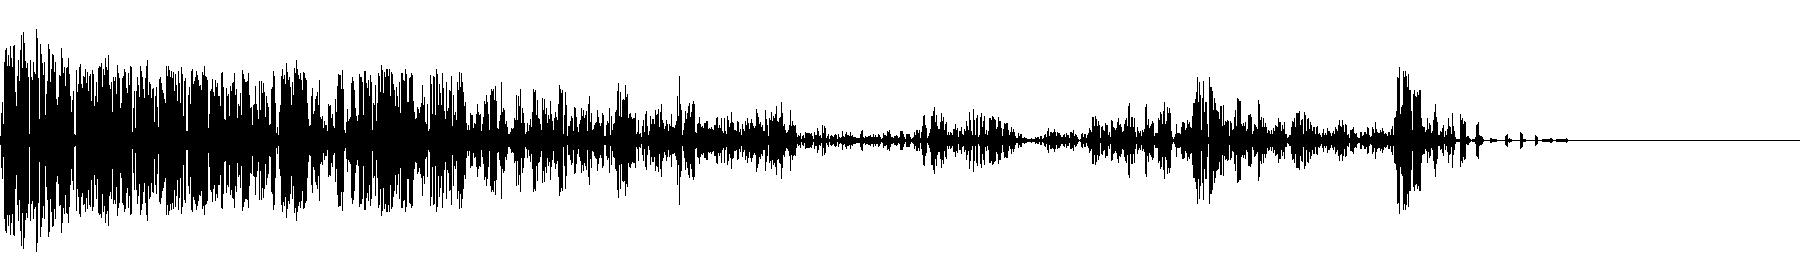 tube clap 3